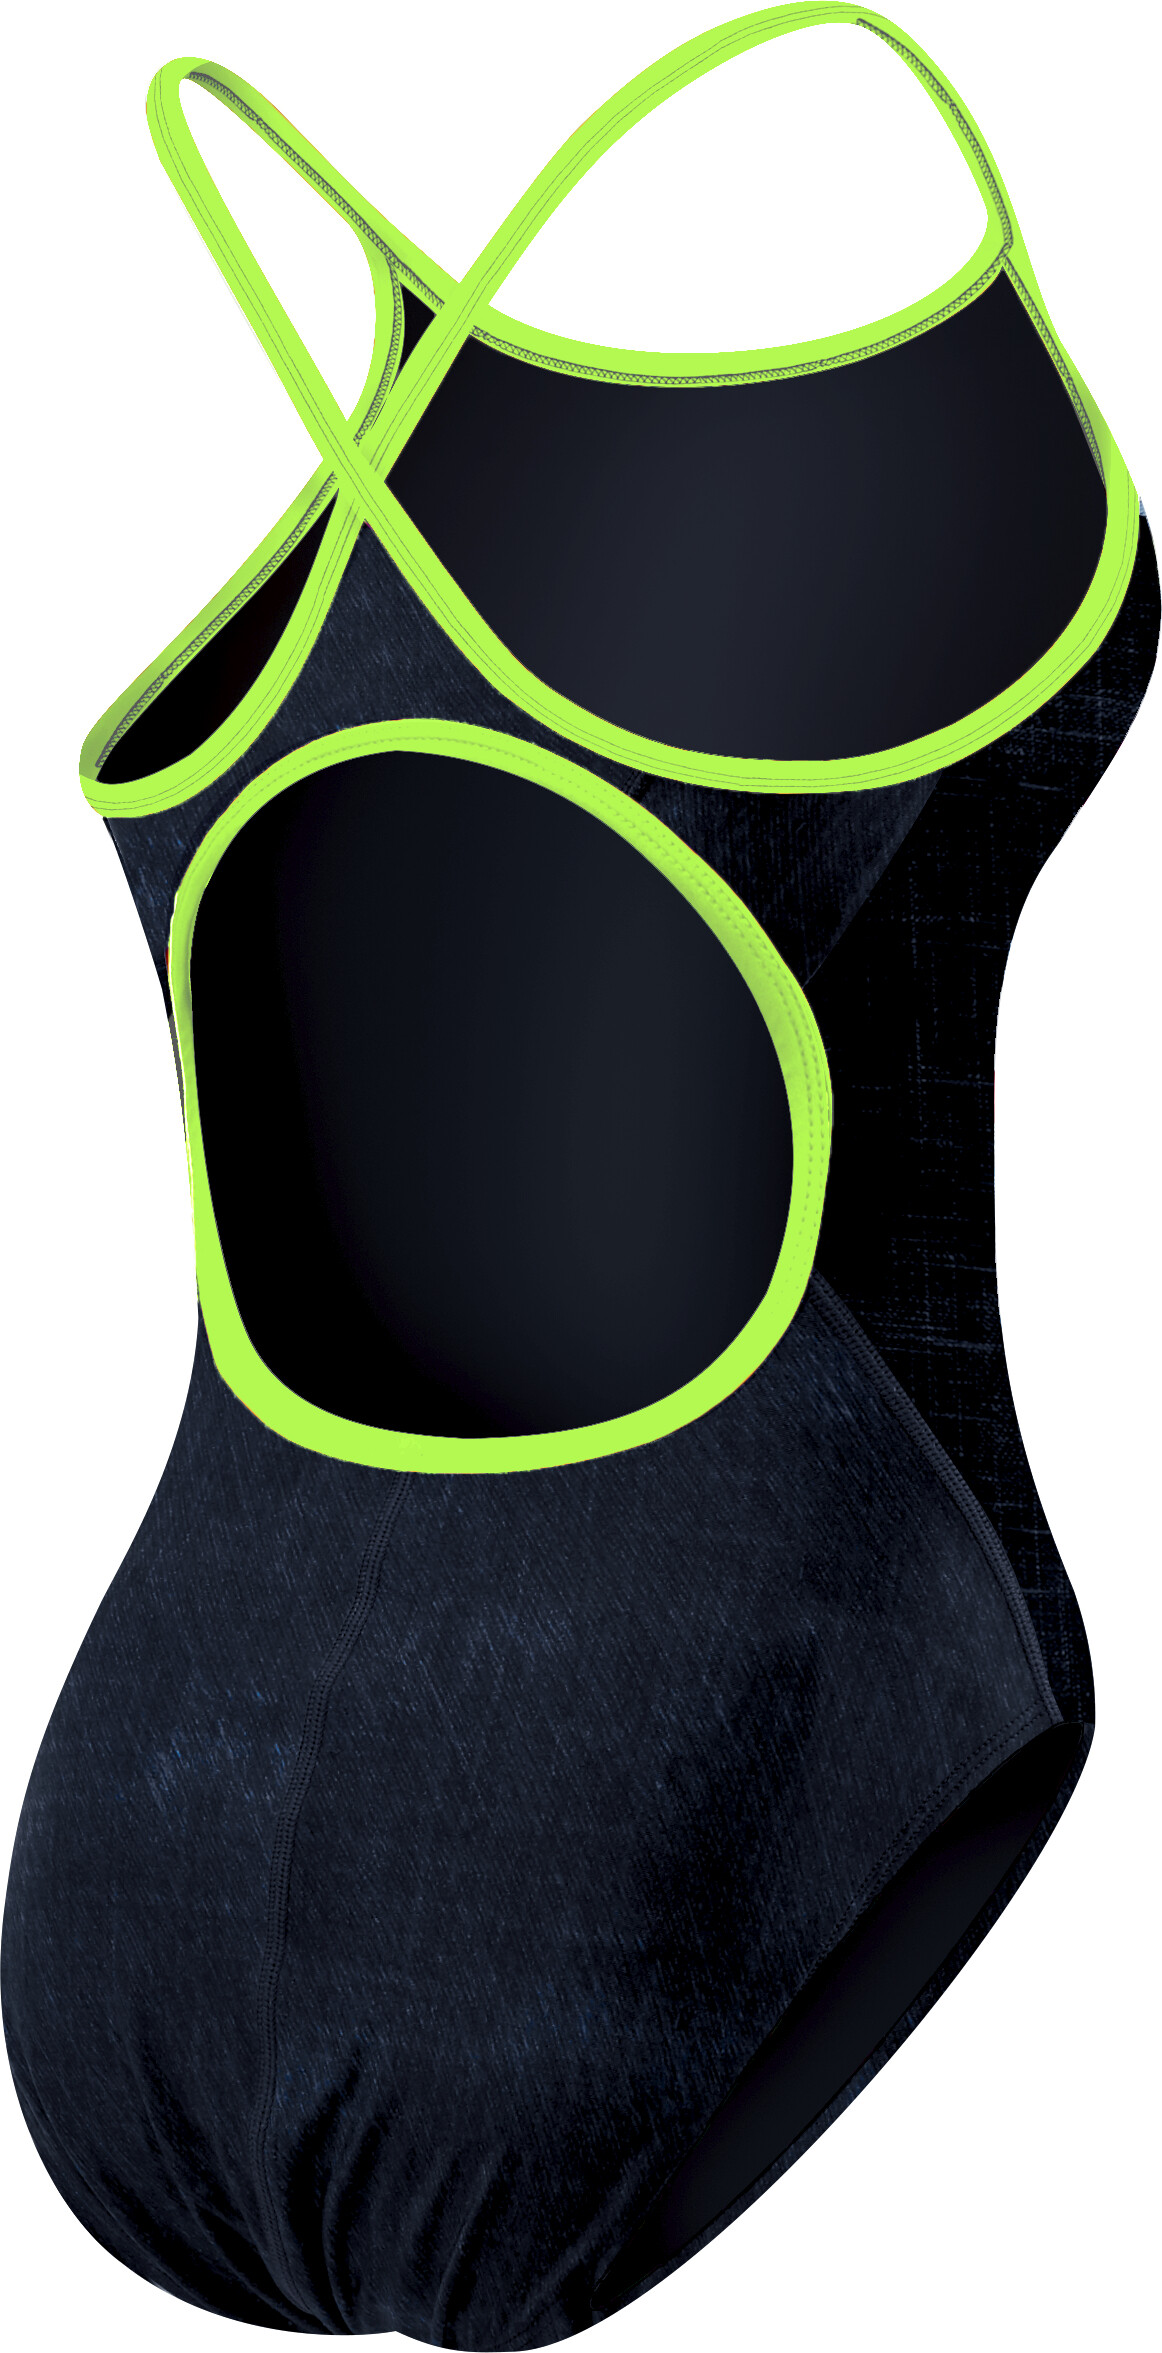 2be71027f6 TYR Sandblasted Diamondfit Swimsuit Women black at Addnature.co.uk